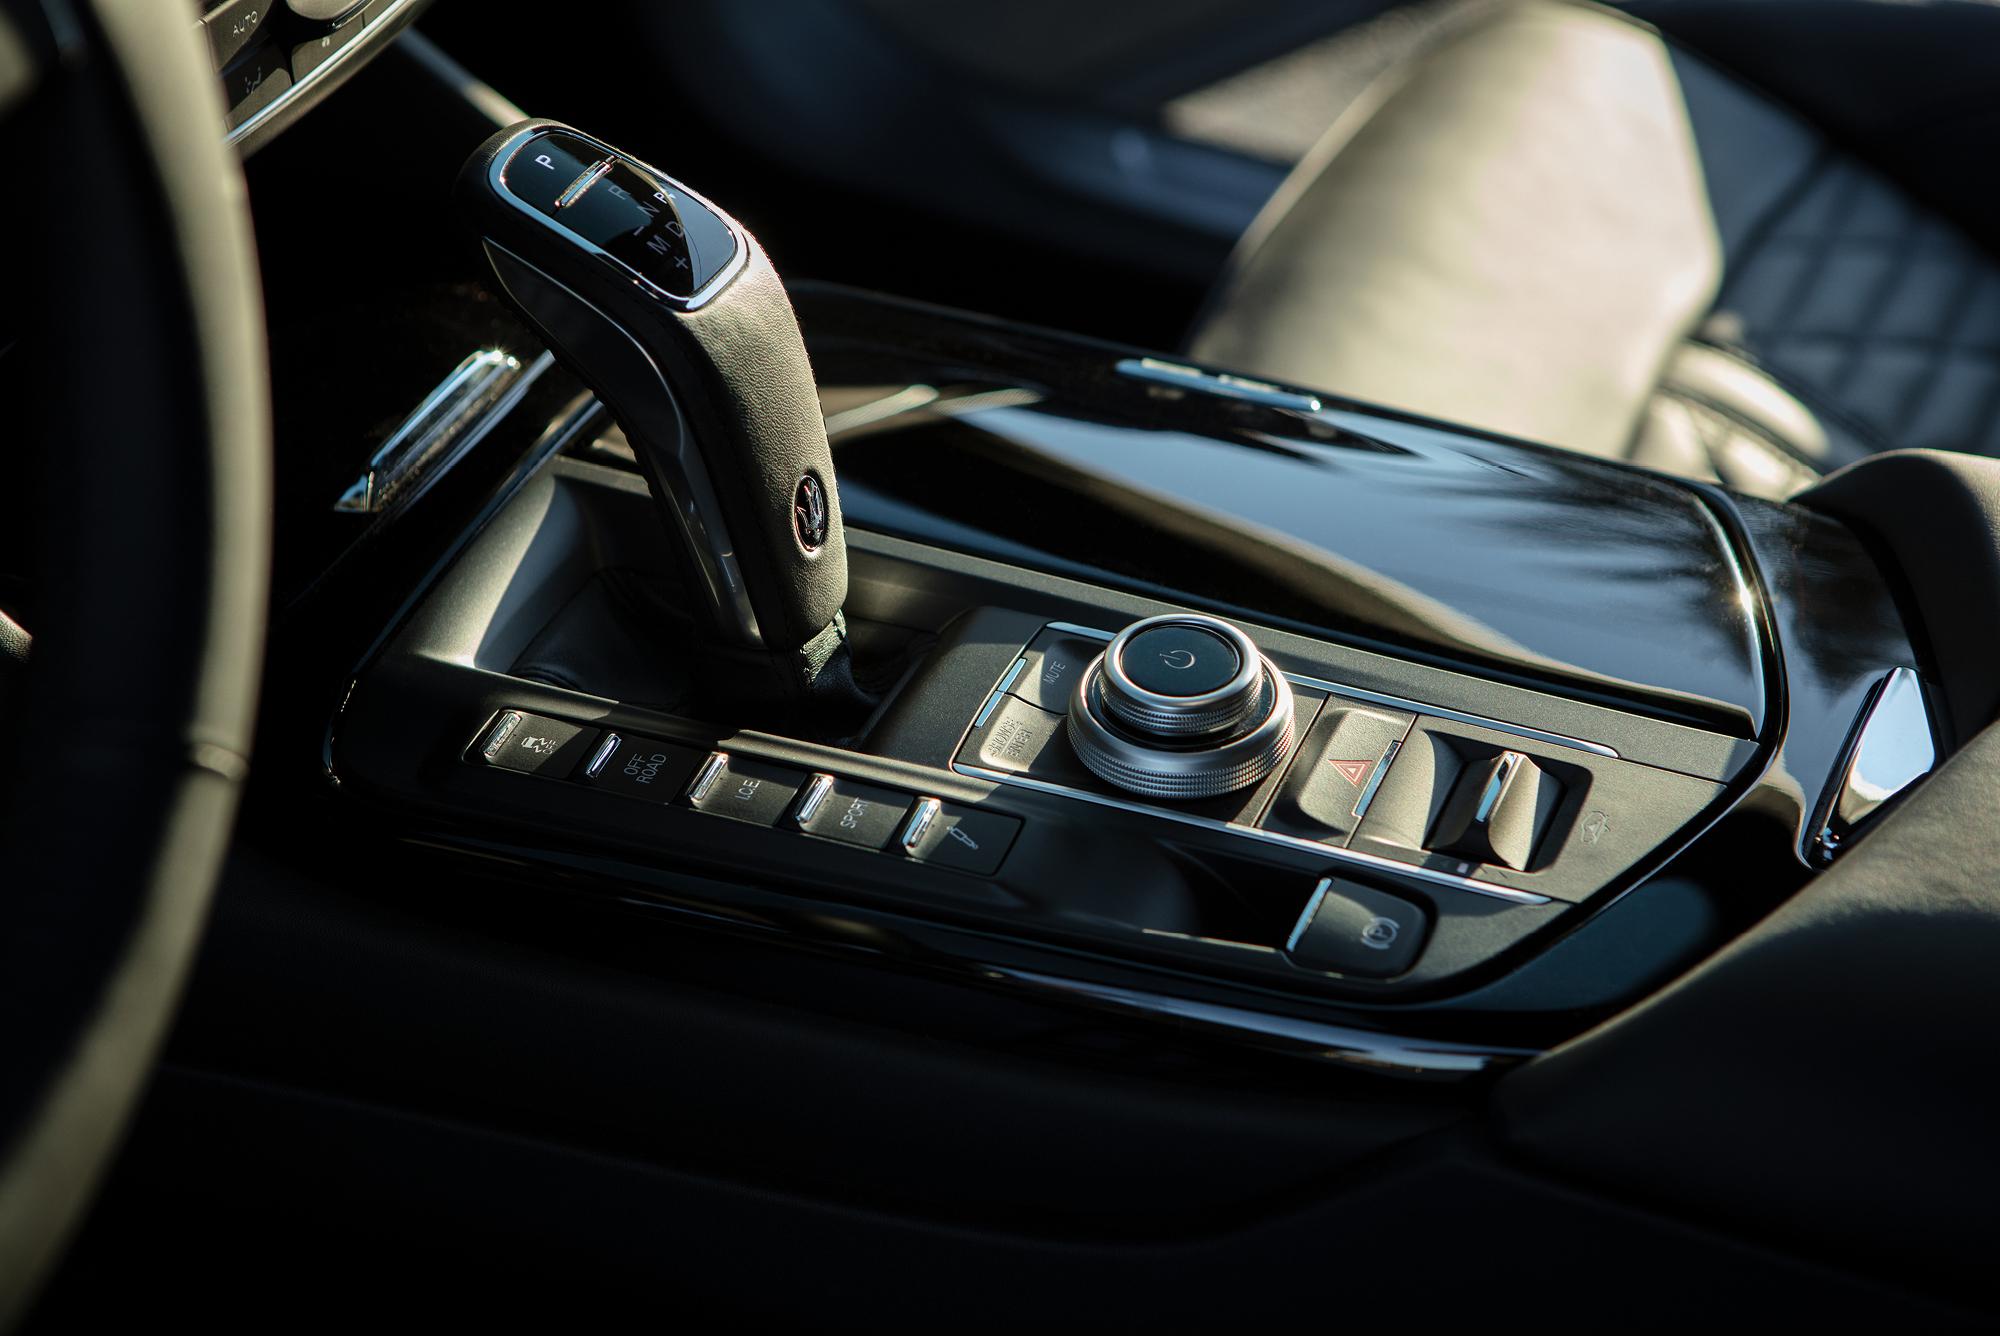 The sleek interior of the Levante Hybrid